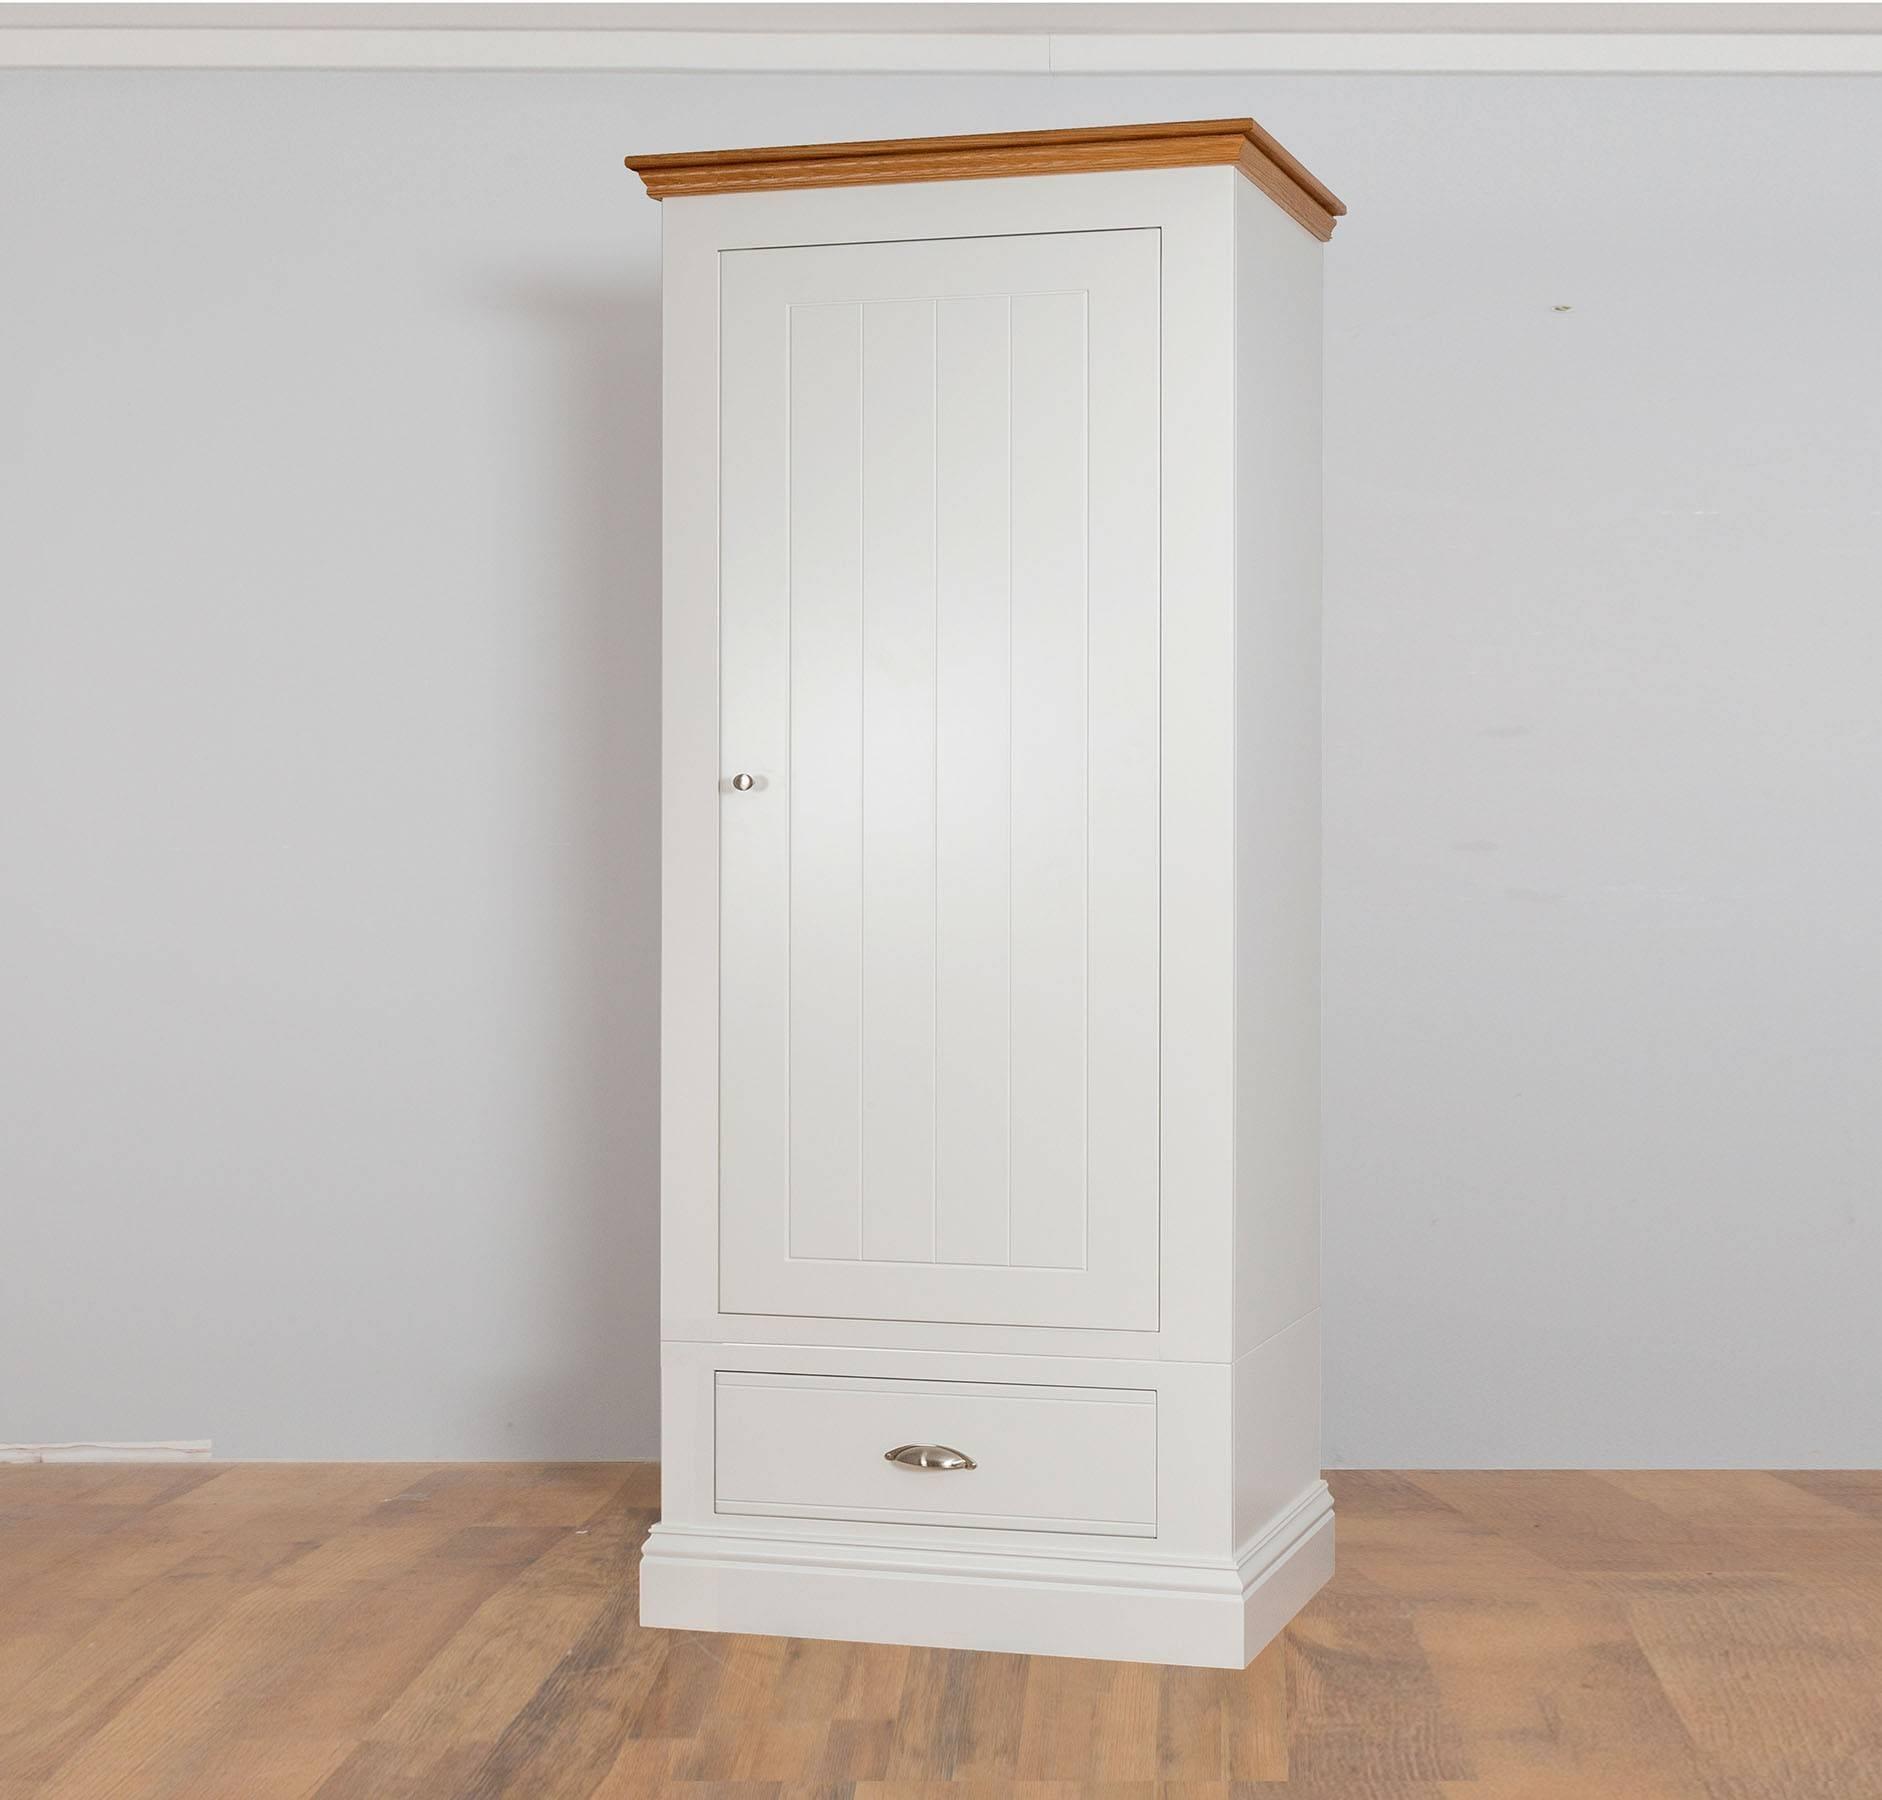 Jared Kushner Tags : 44 Unbelievable White Single Door Wardrobe Inside Single Wardrobes (View 3 of 15)